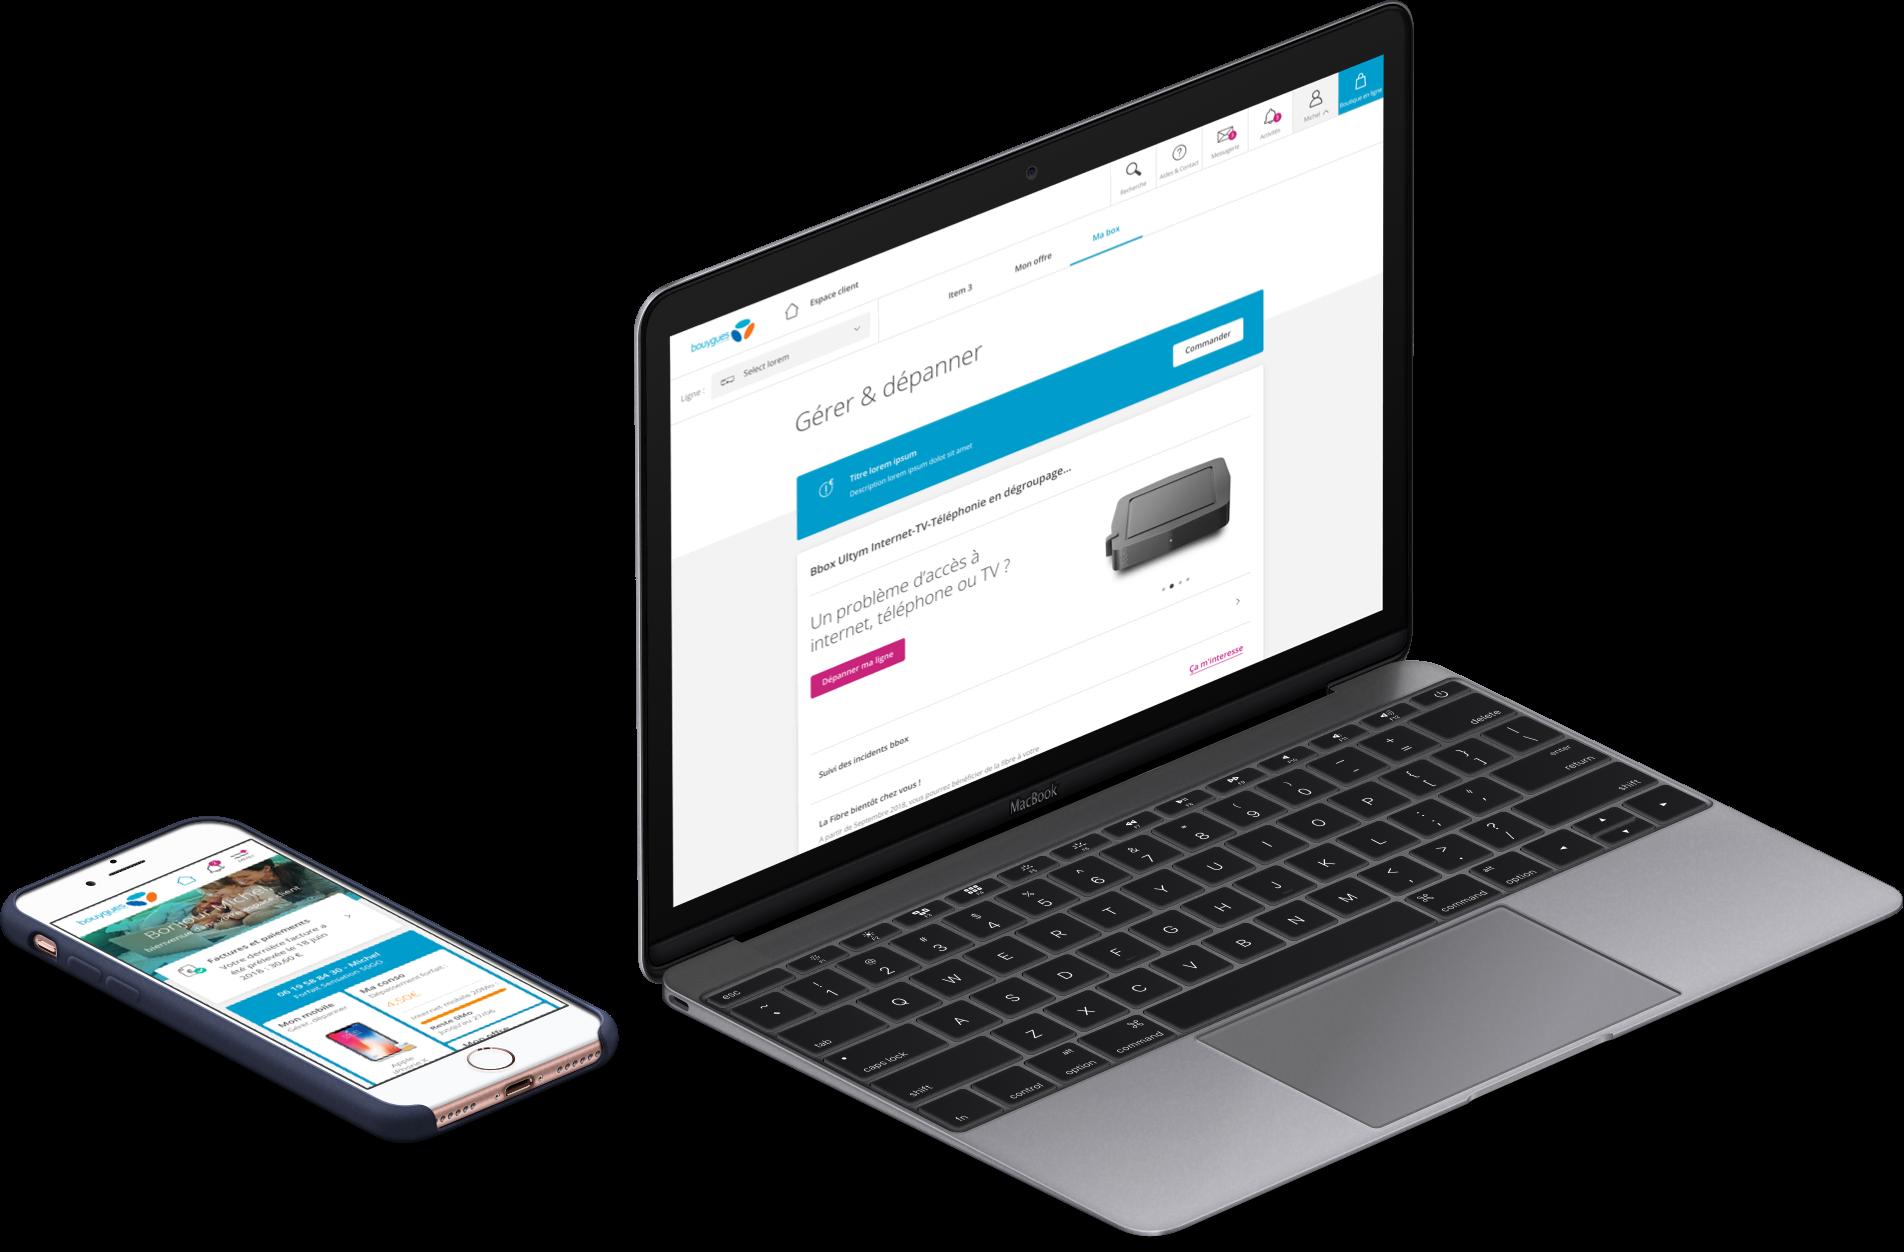 projet-bouygues_telecom-website-robin_p-designer_01@2x